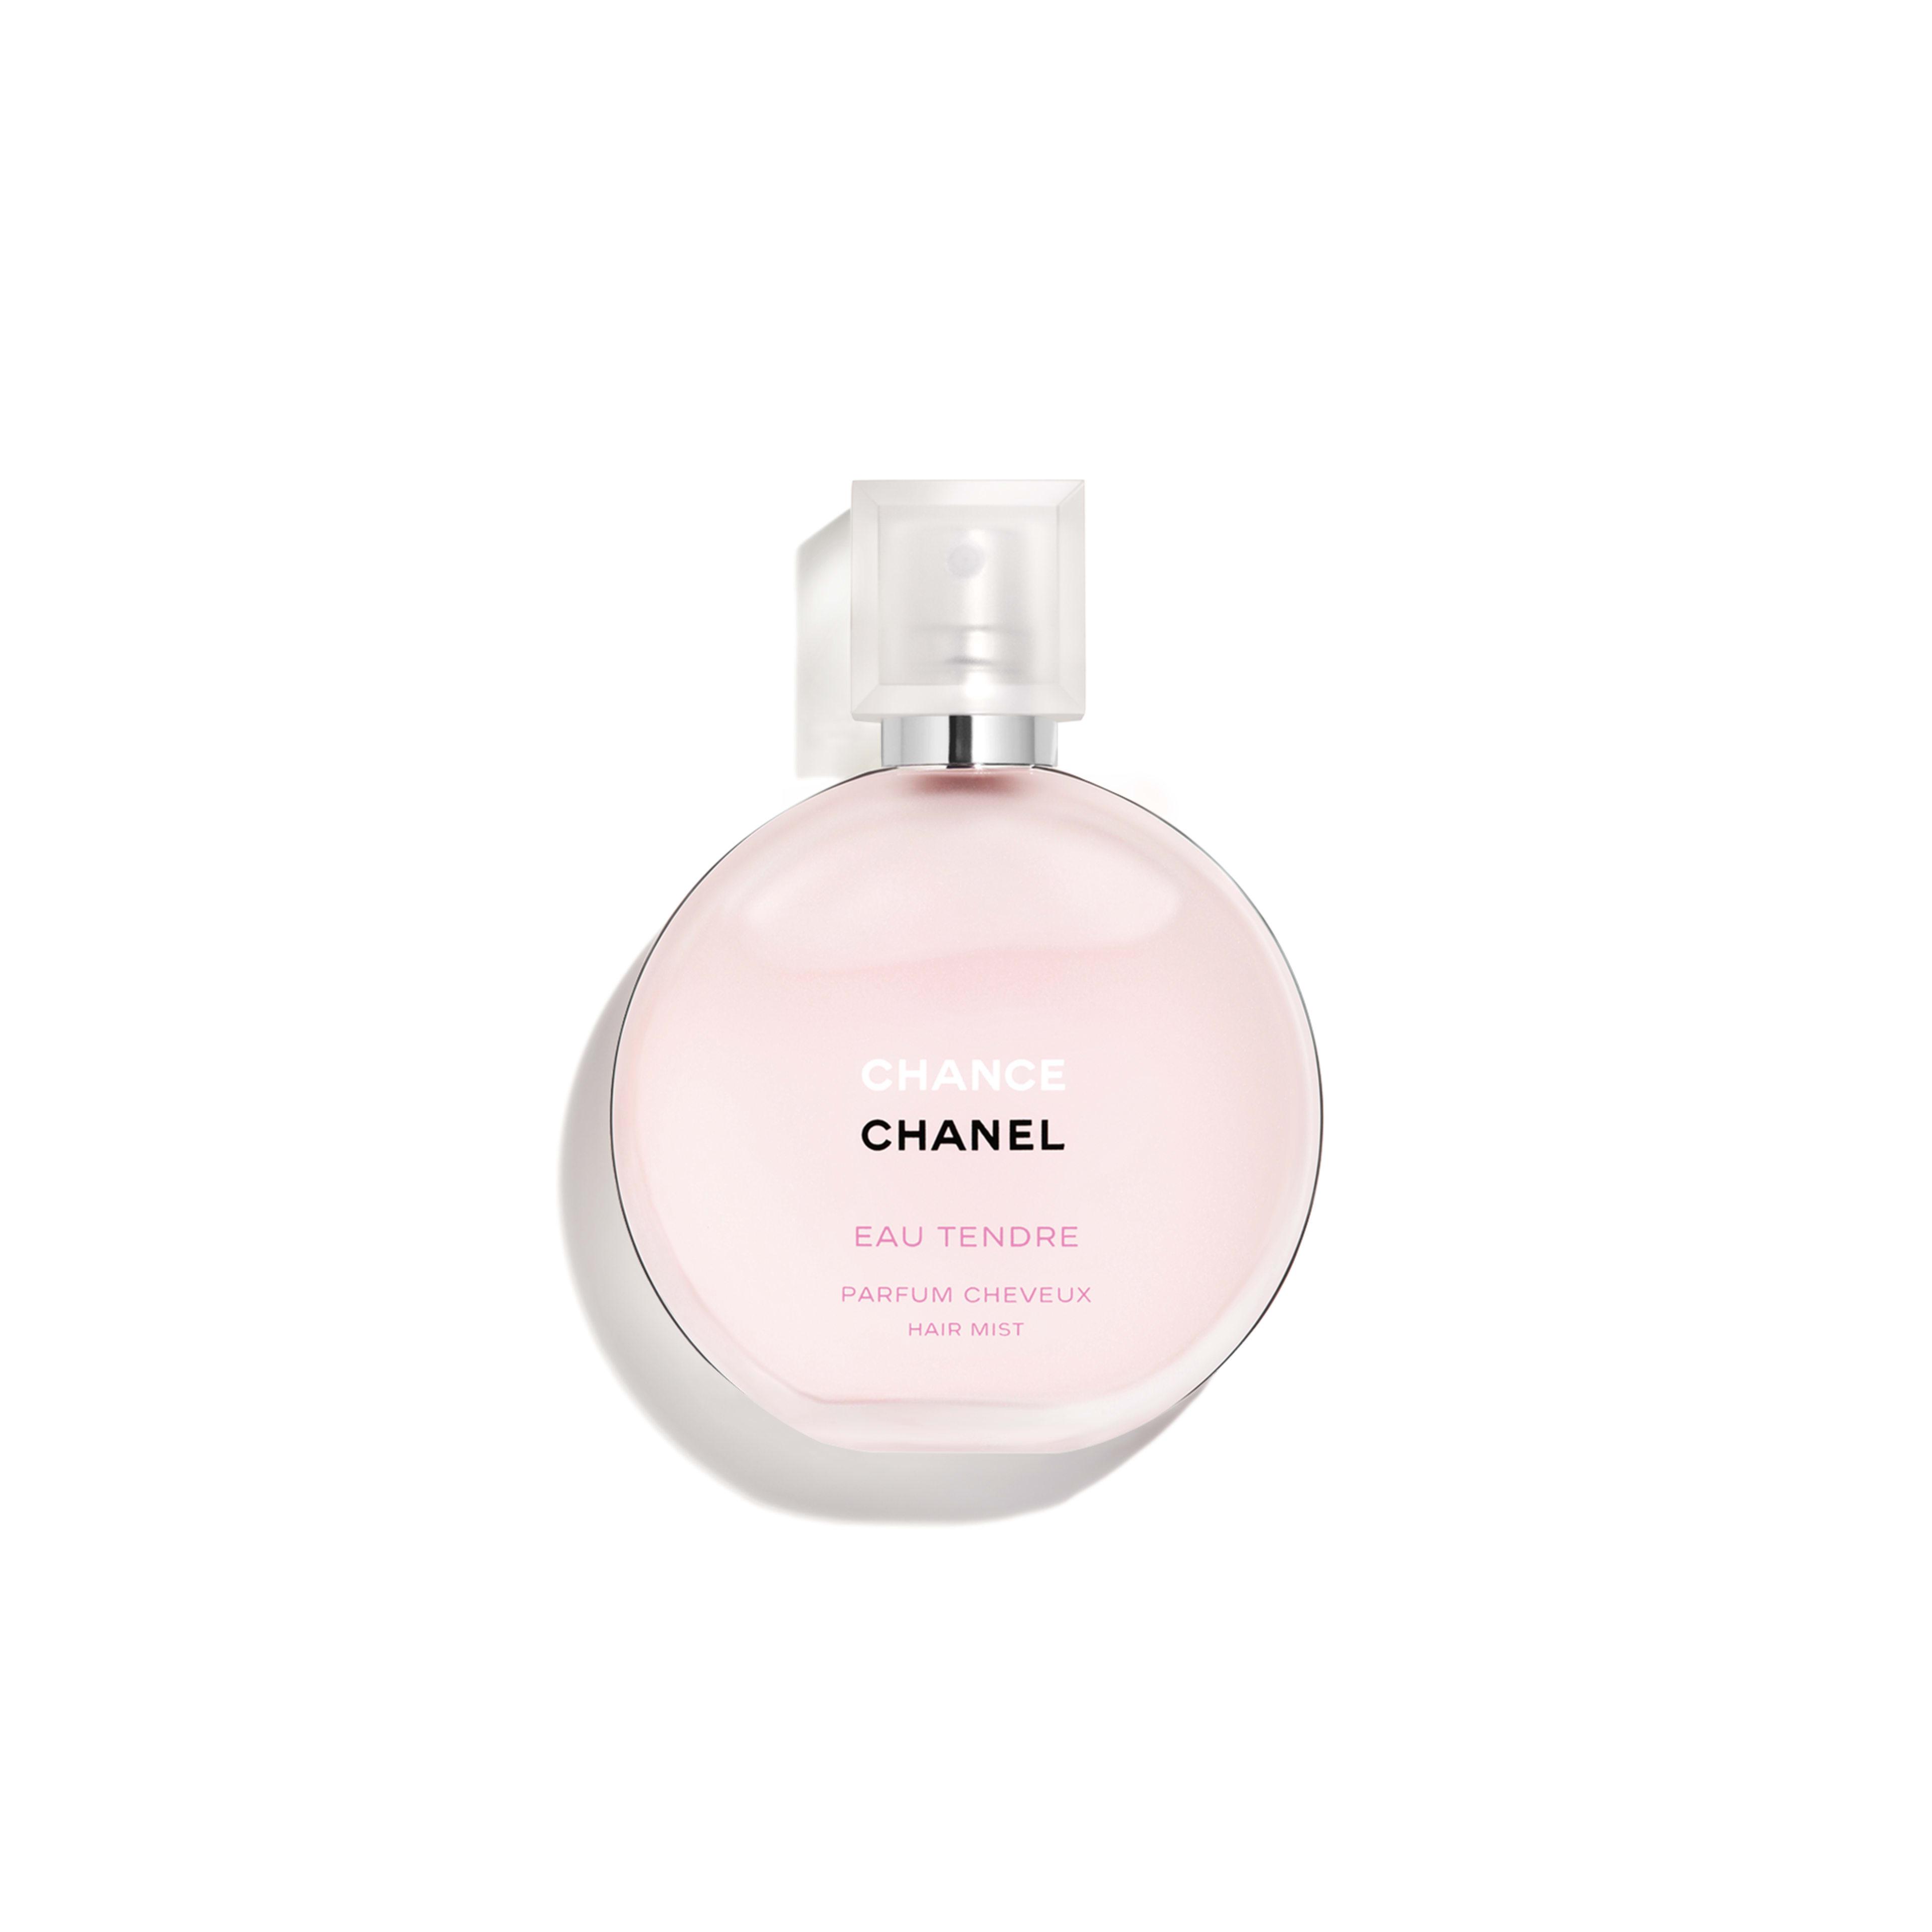 CHANCE EAU TENDRE - fragrance - 35ml - Widok domyślny